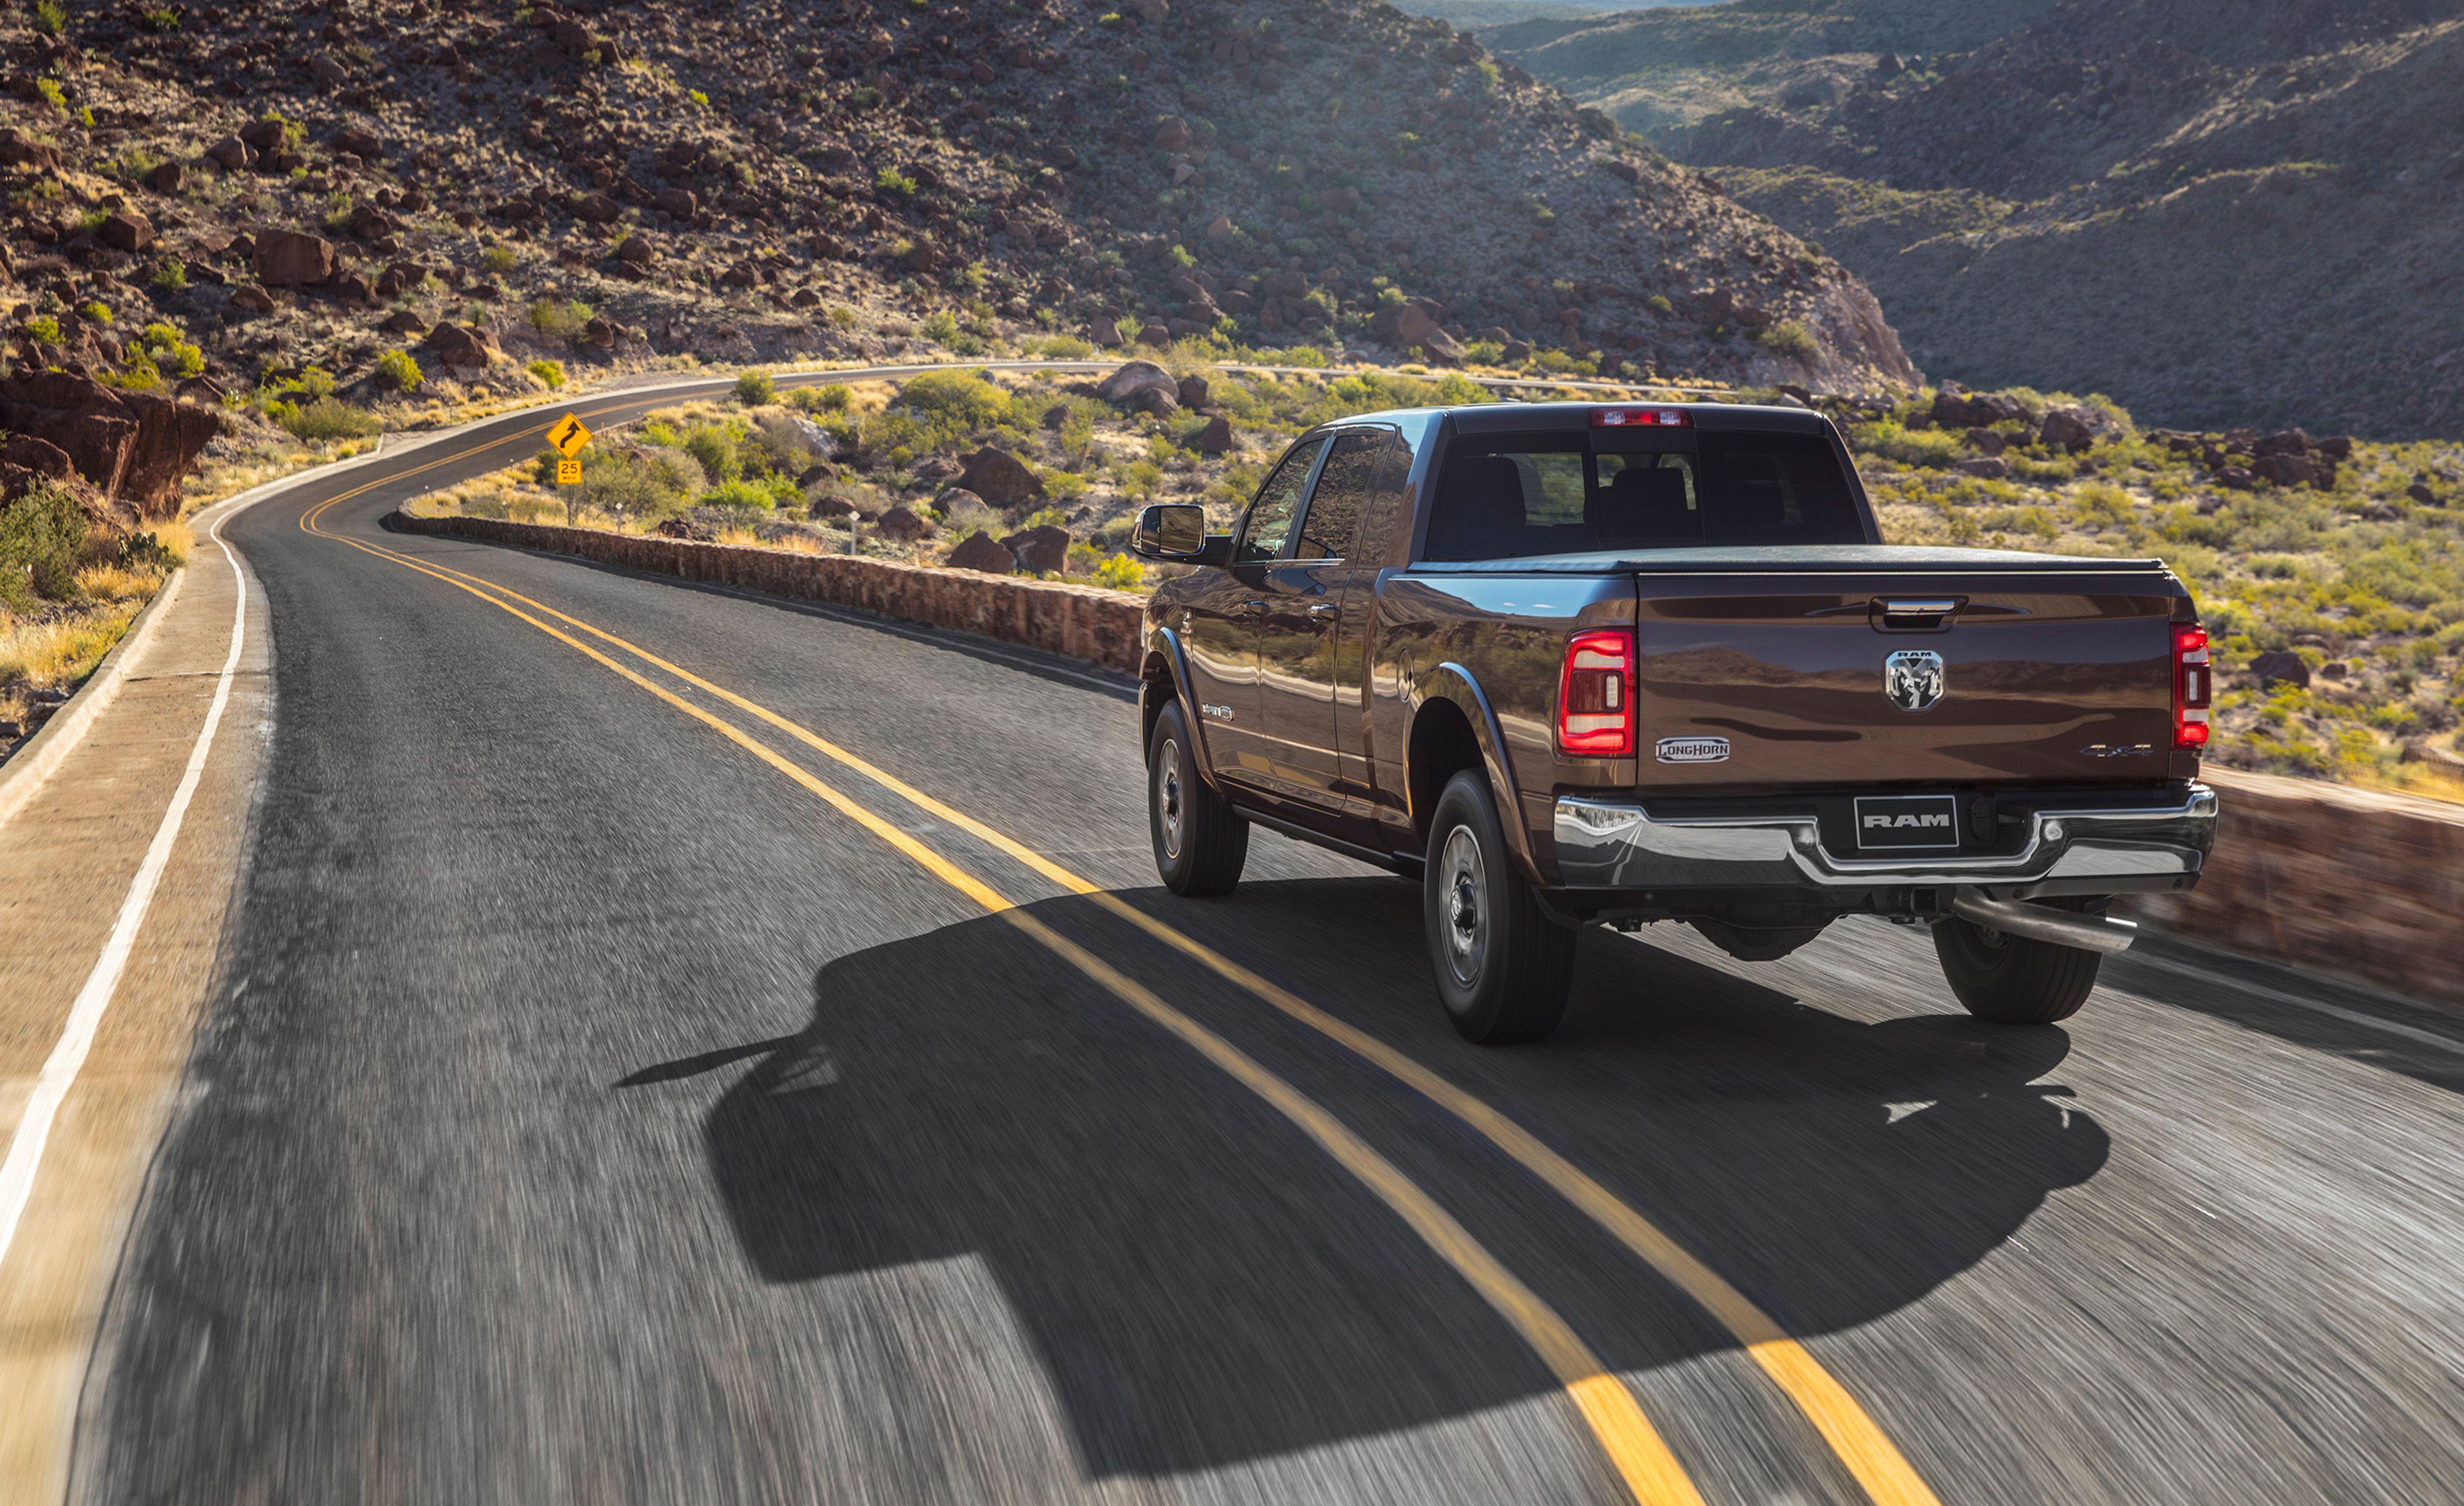 2019 Ram Hd Pickup Truck Cummins Diesel Has 1000 Lb Ft Of Torque